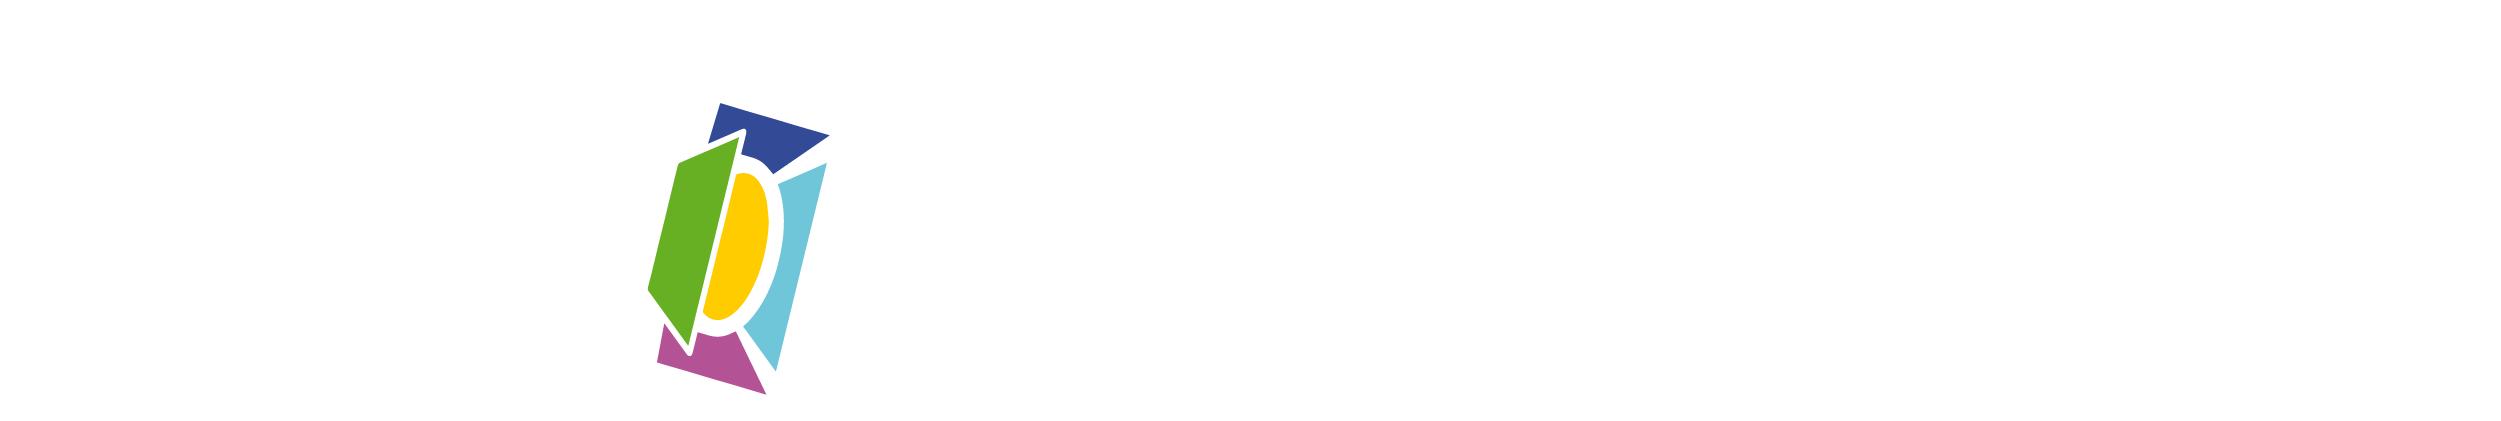 almamedia | beeldbepalend